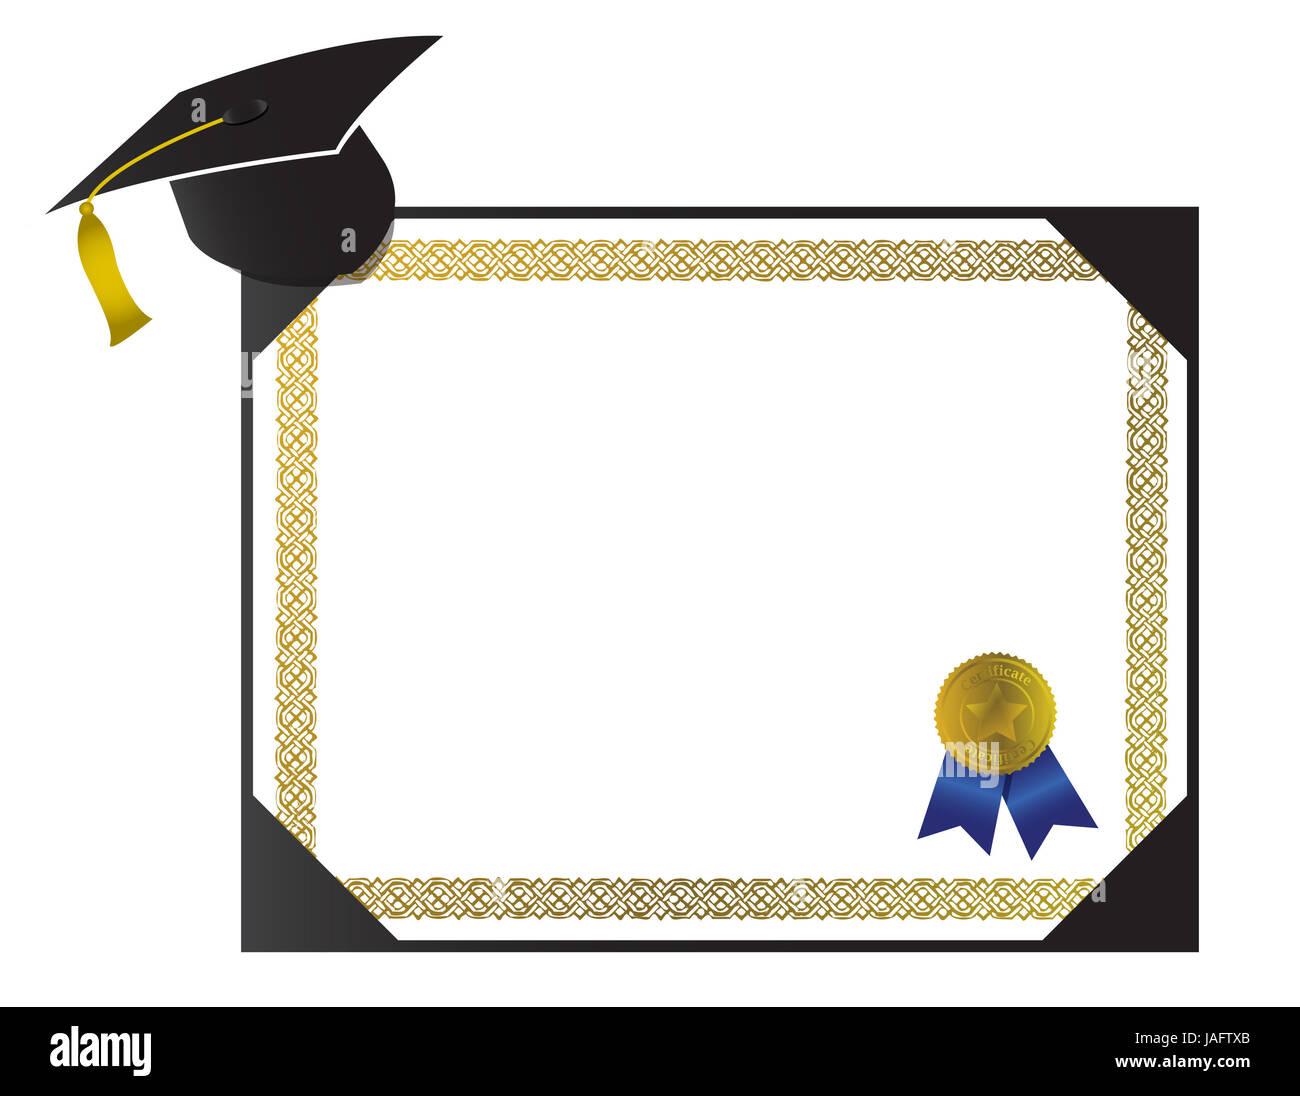 Diploma Holder Stockfotos & Diploma Holder Bilder - Alamy